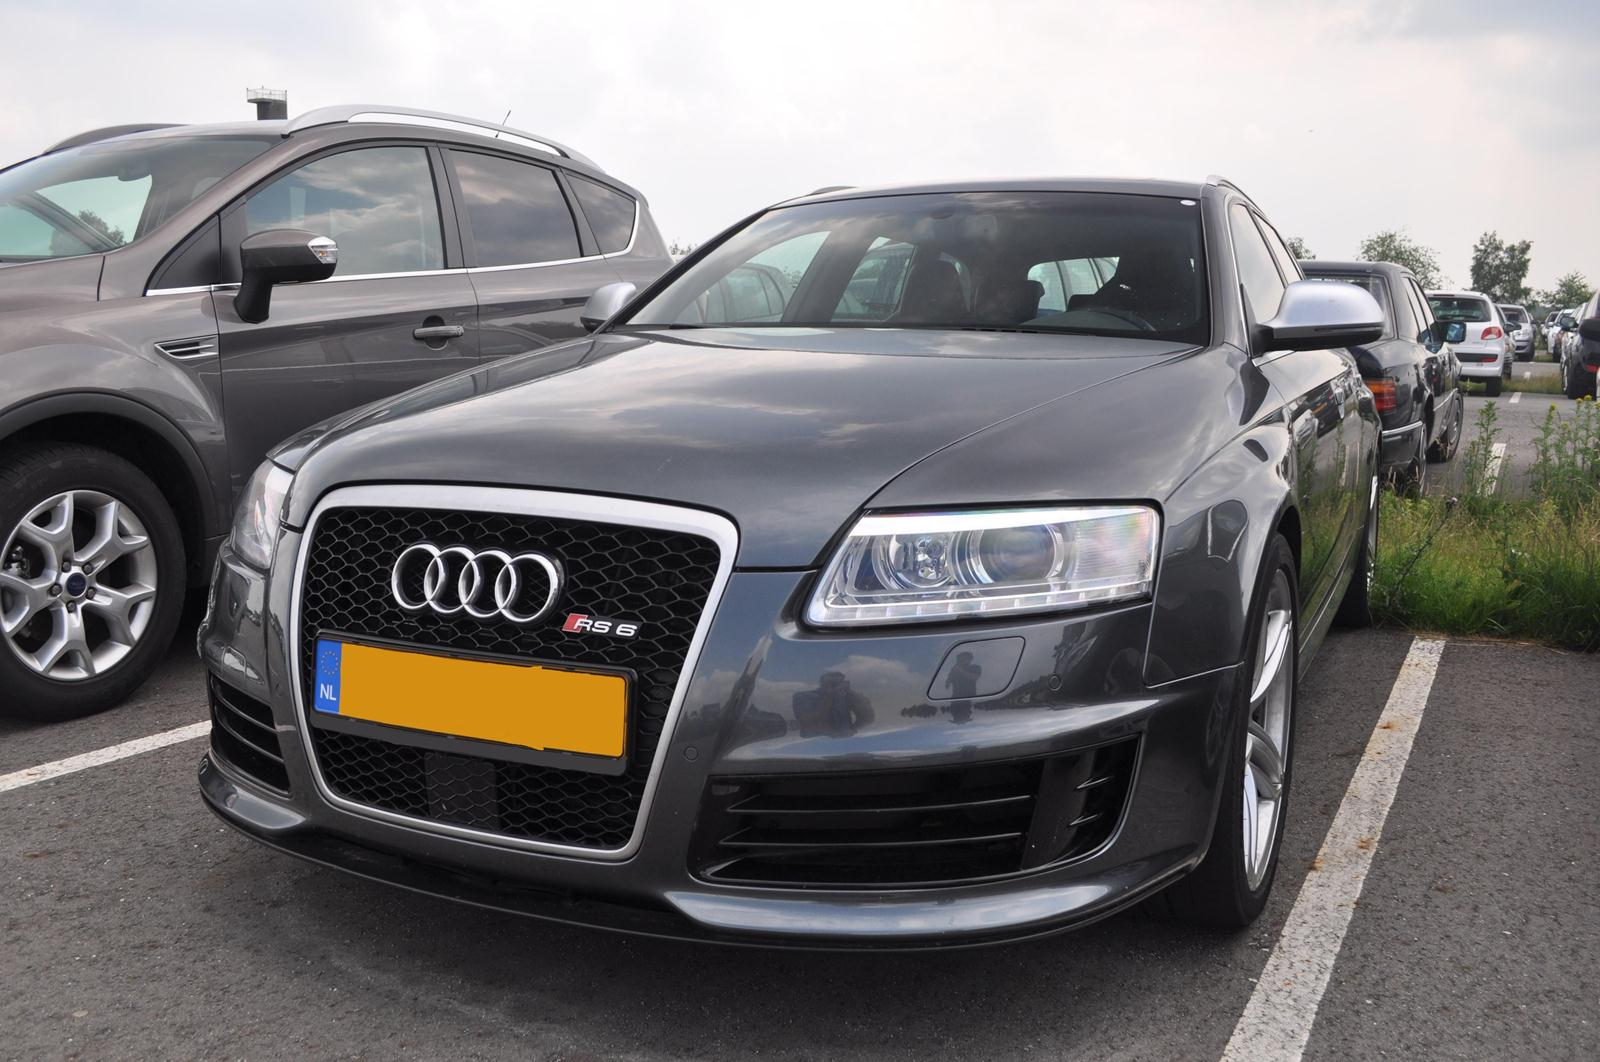 Audi Rs6 Avant C7 Www Hartvoorautos Nl Hartvoorautos Nl